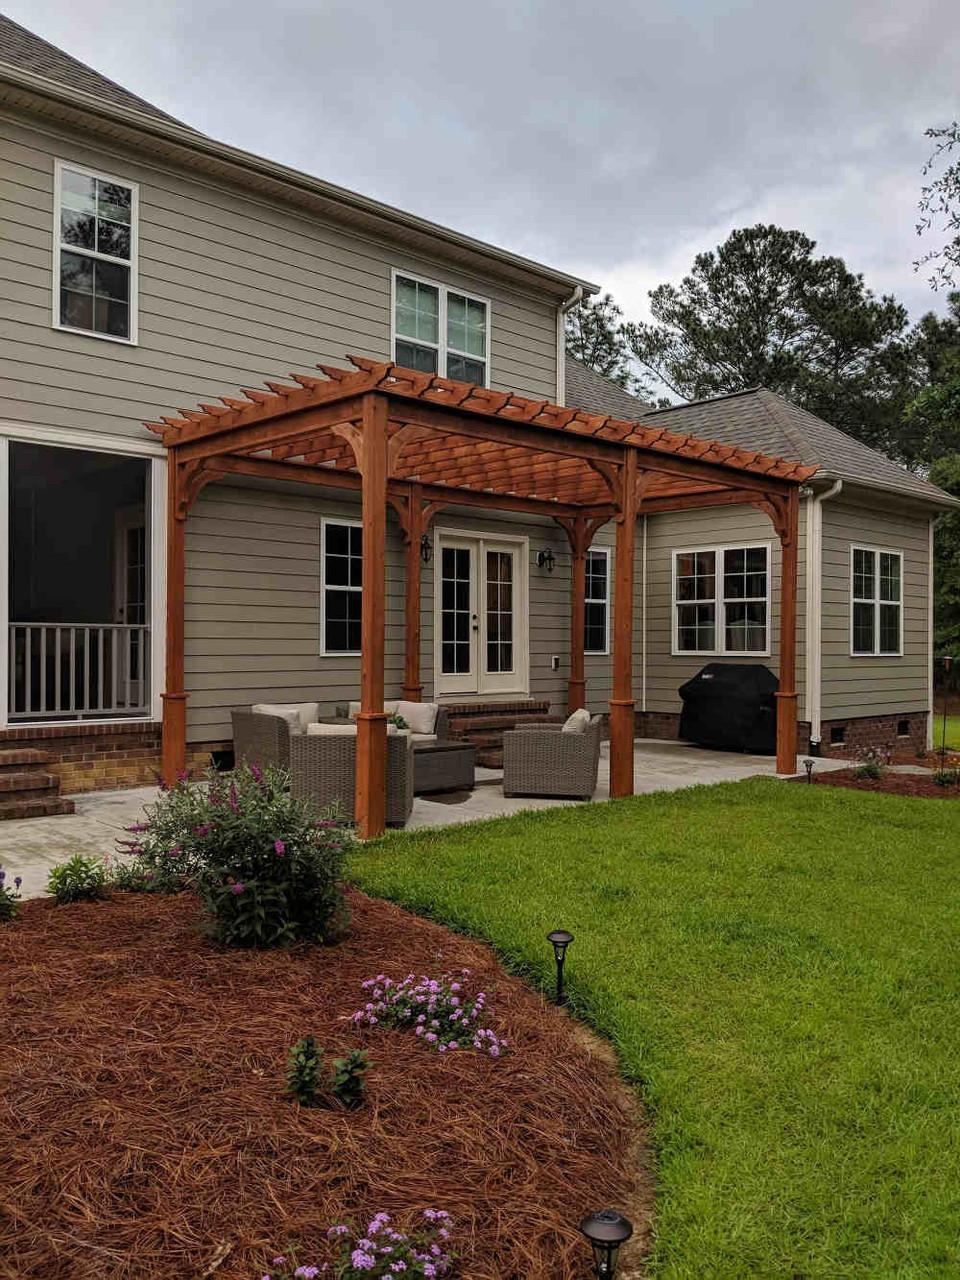 11x20 Serenity Cedar Pergola Kit Goldsboro NC Free-standing near house